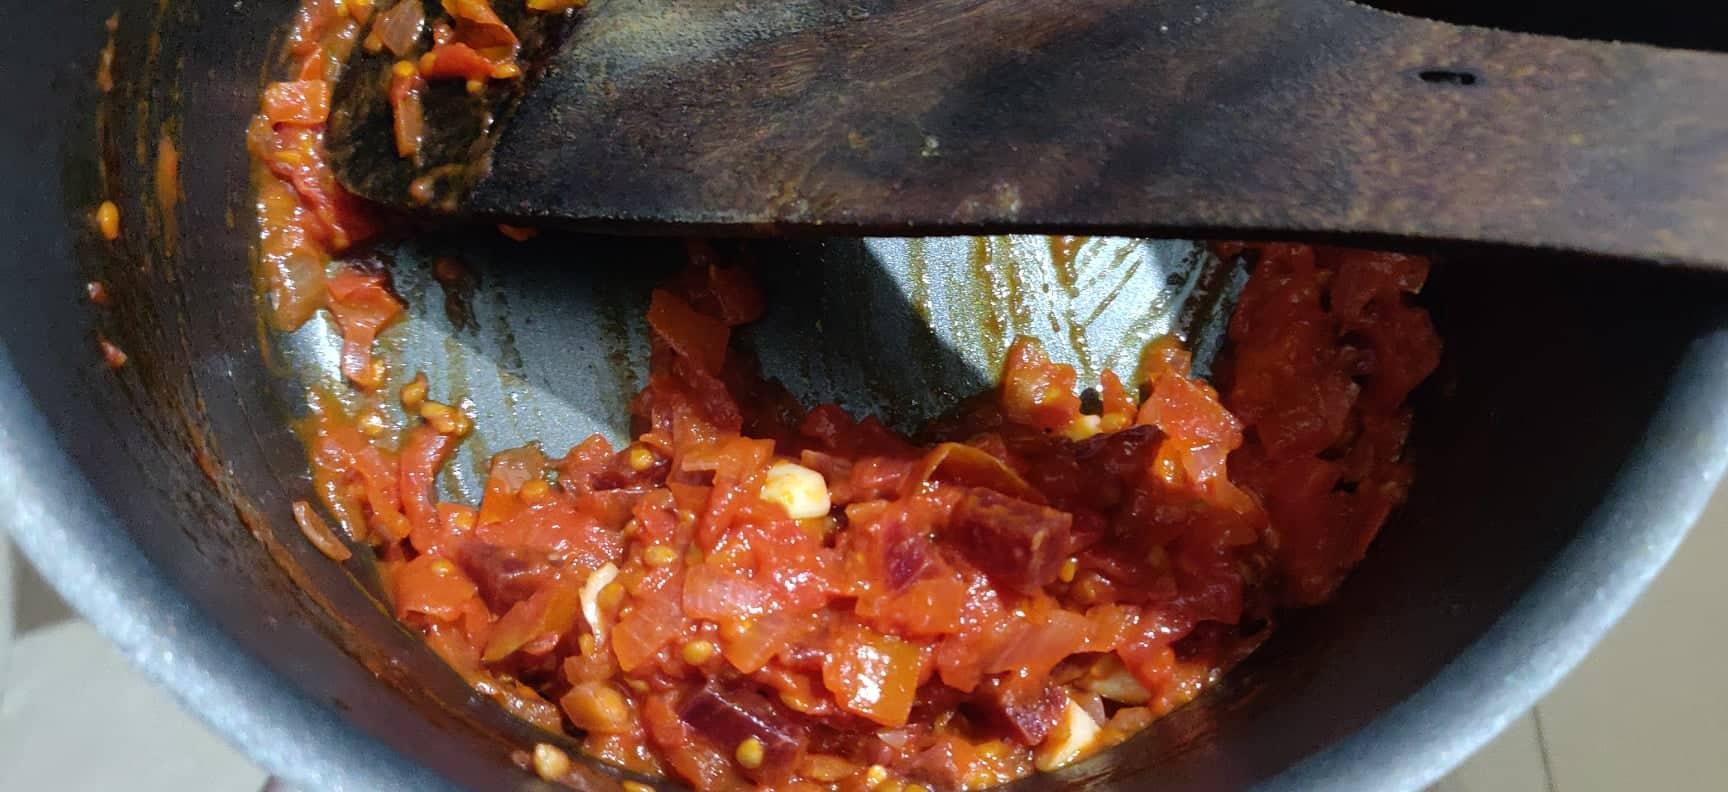 tomato_soup - mixture is mushy